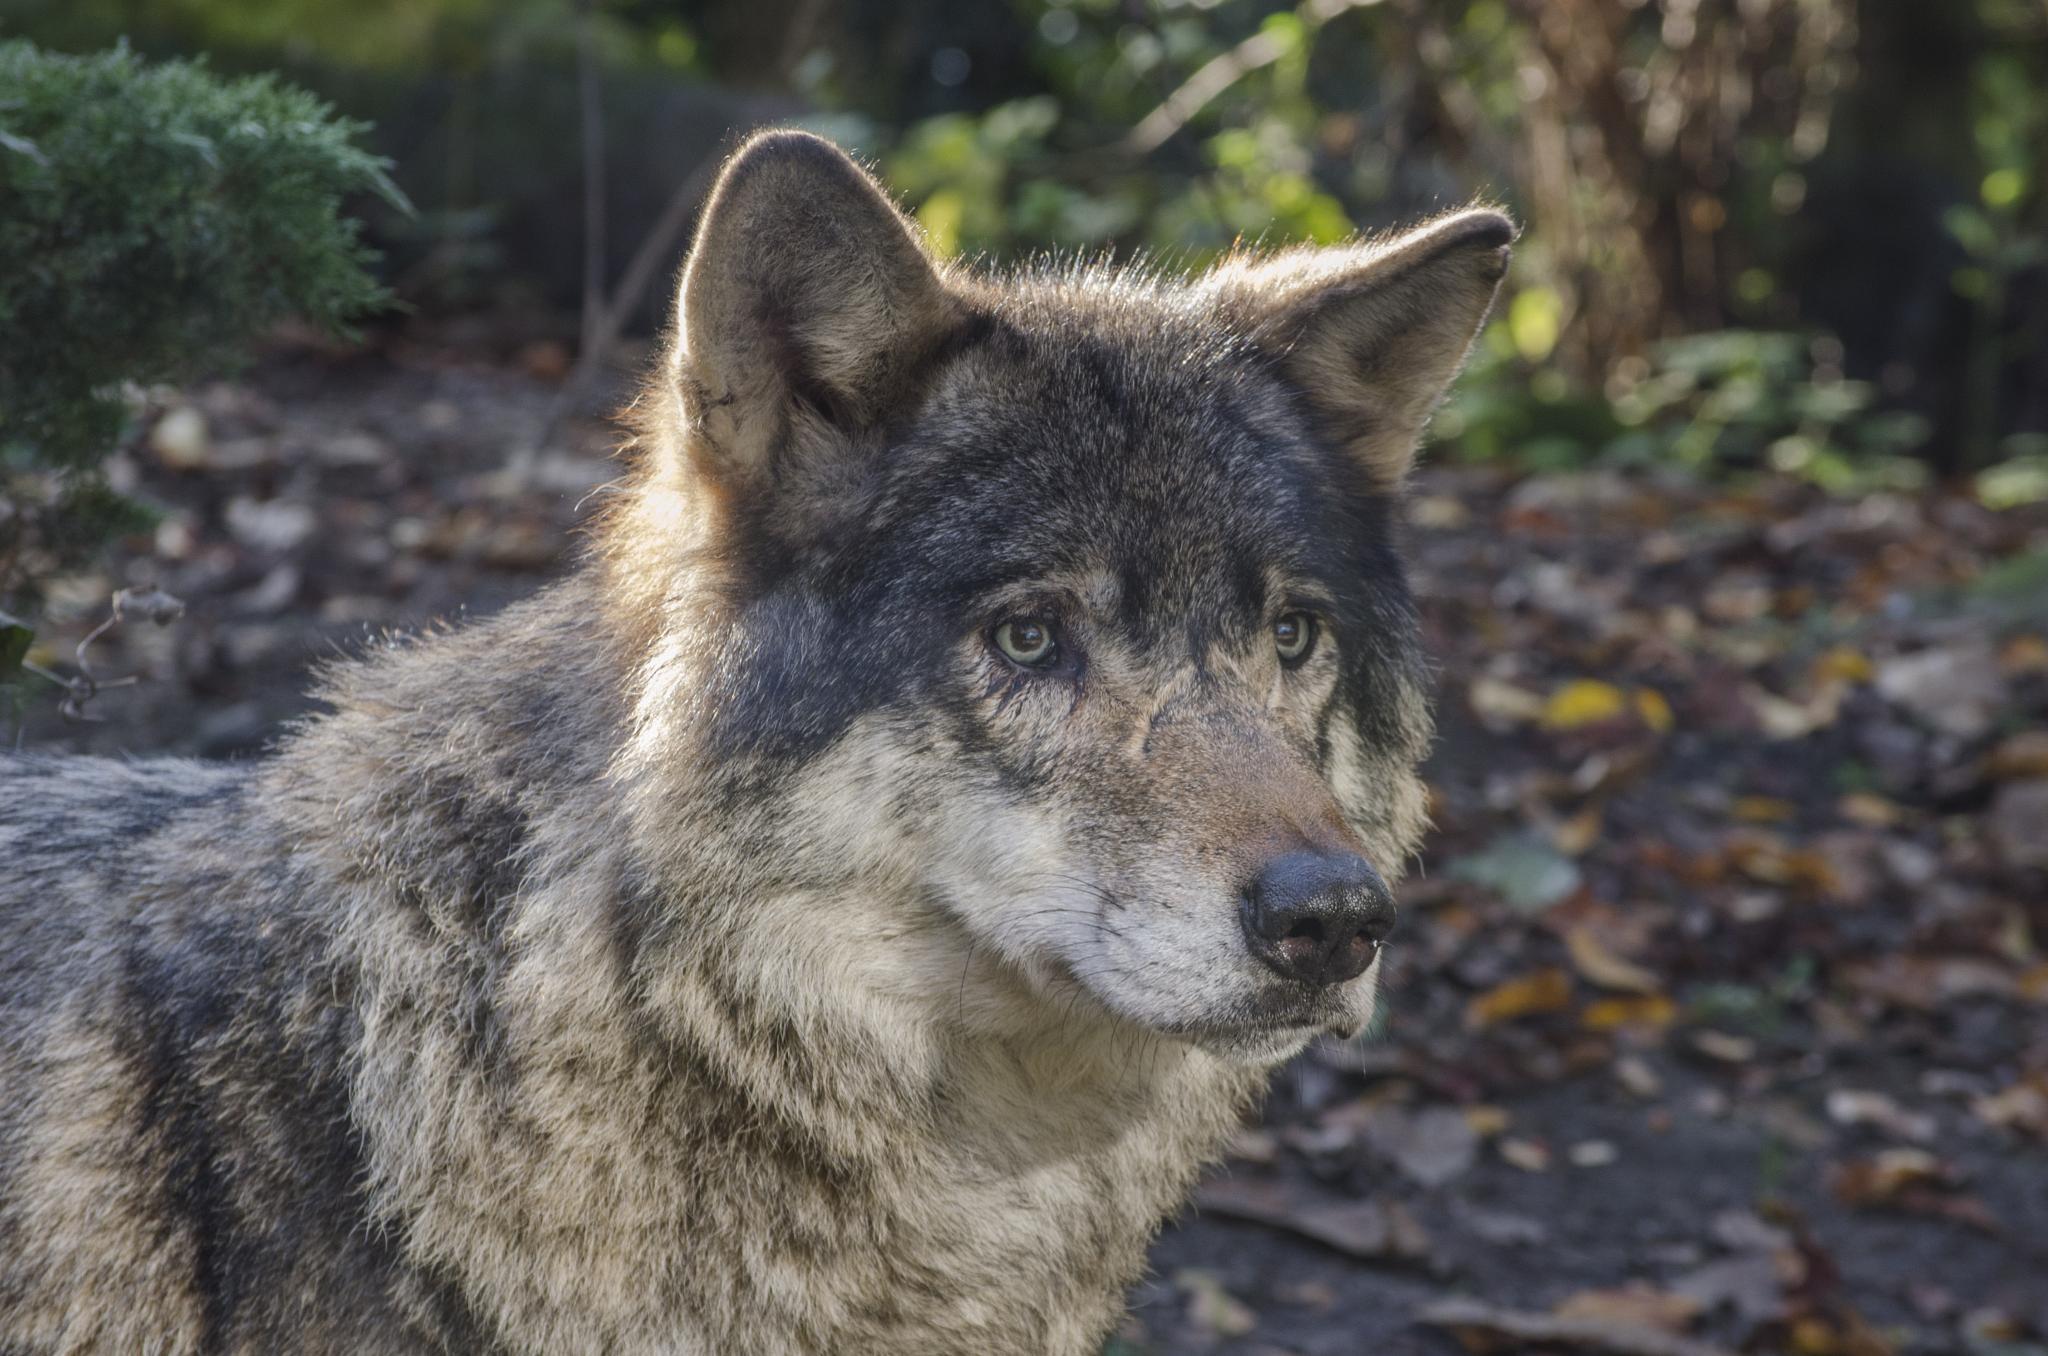 Wolf by erwin.michiels.773